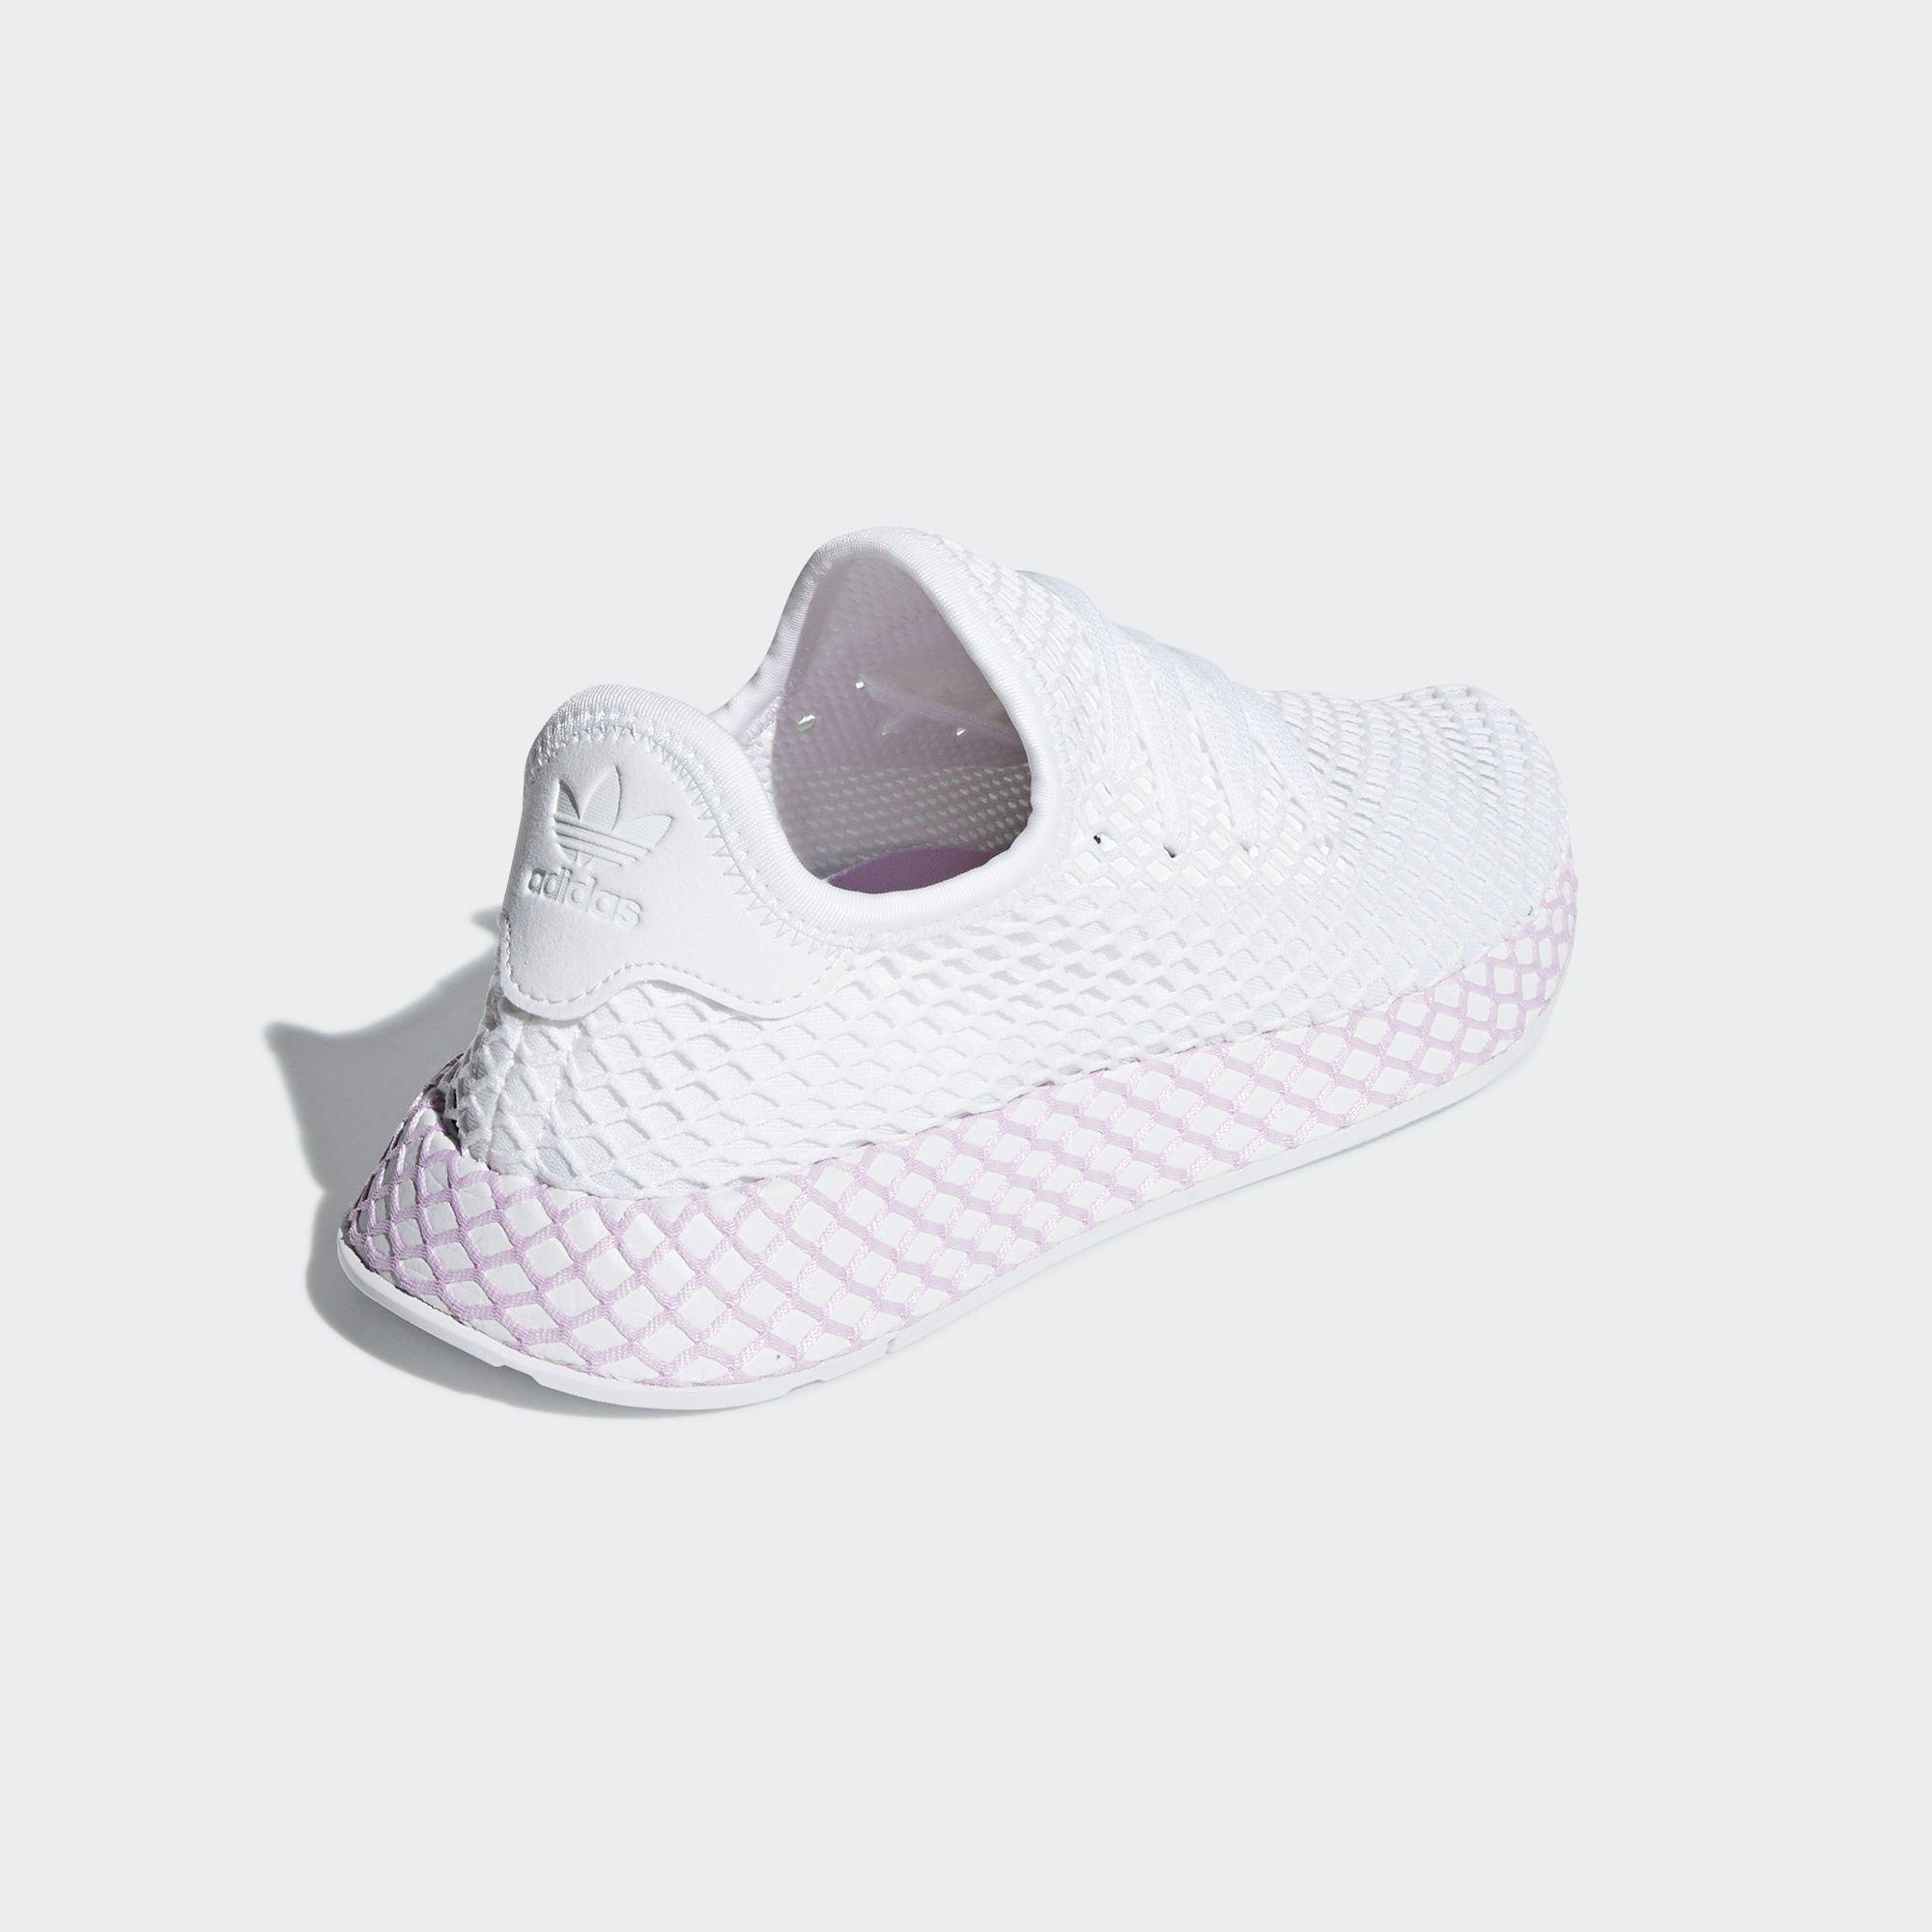 adidas Deerupt 'Clear Lilac' (B37601)